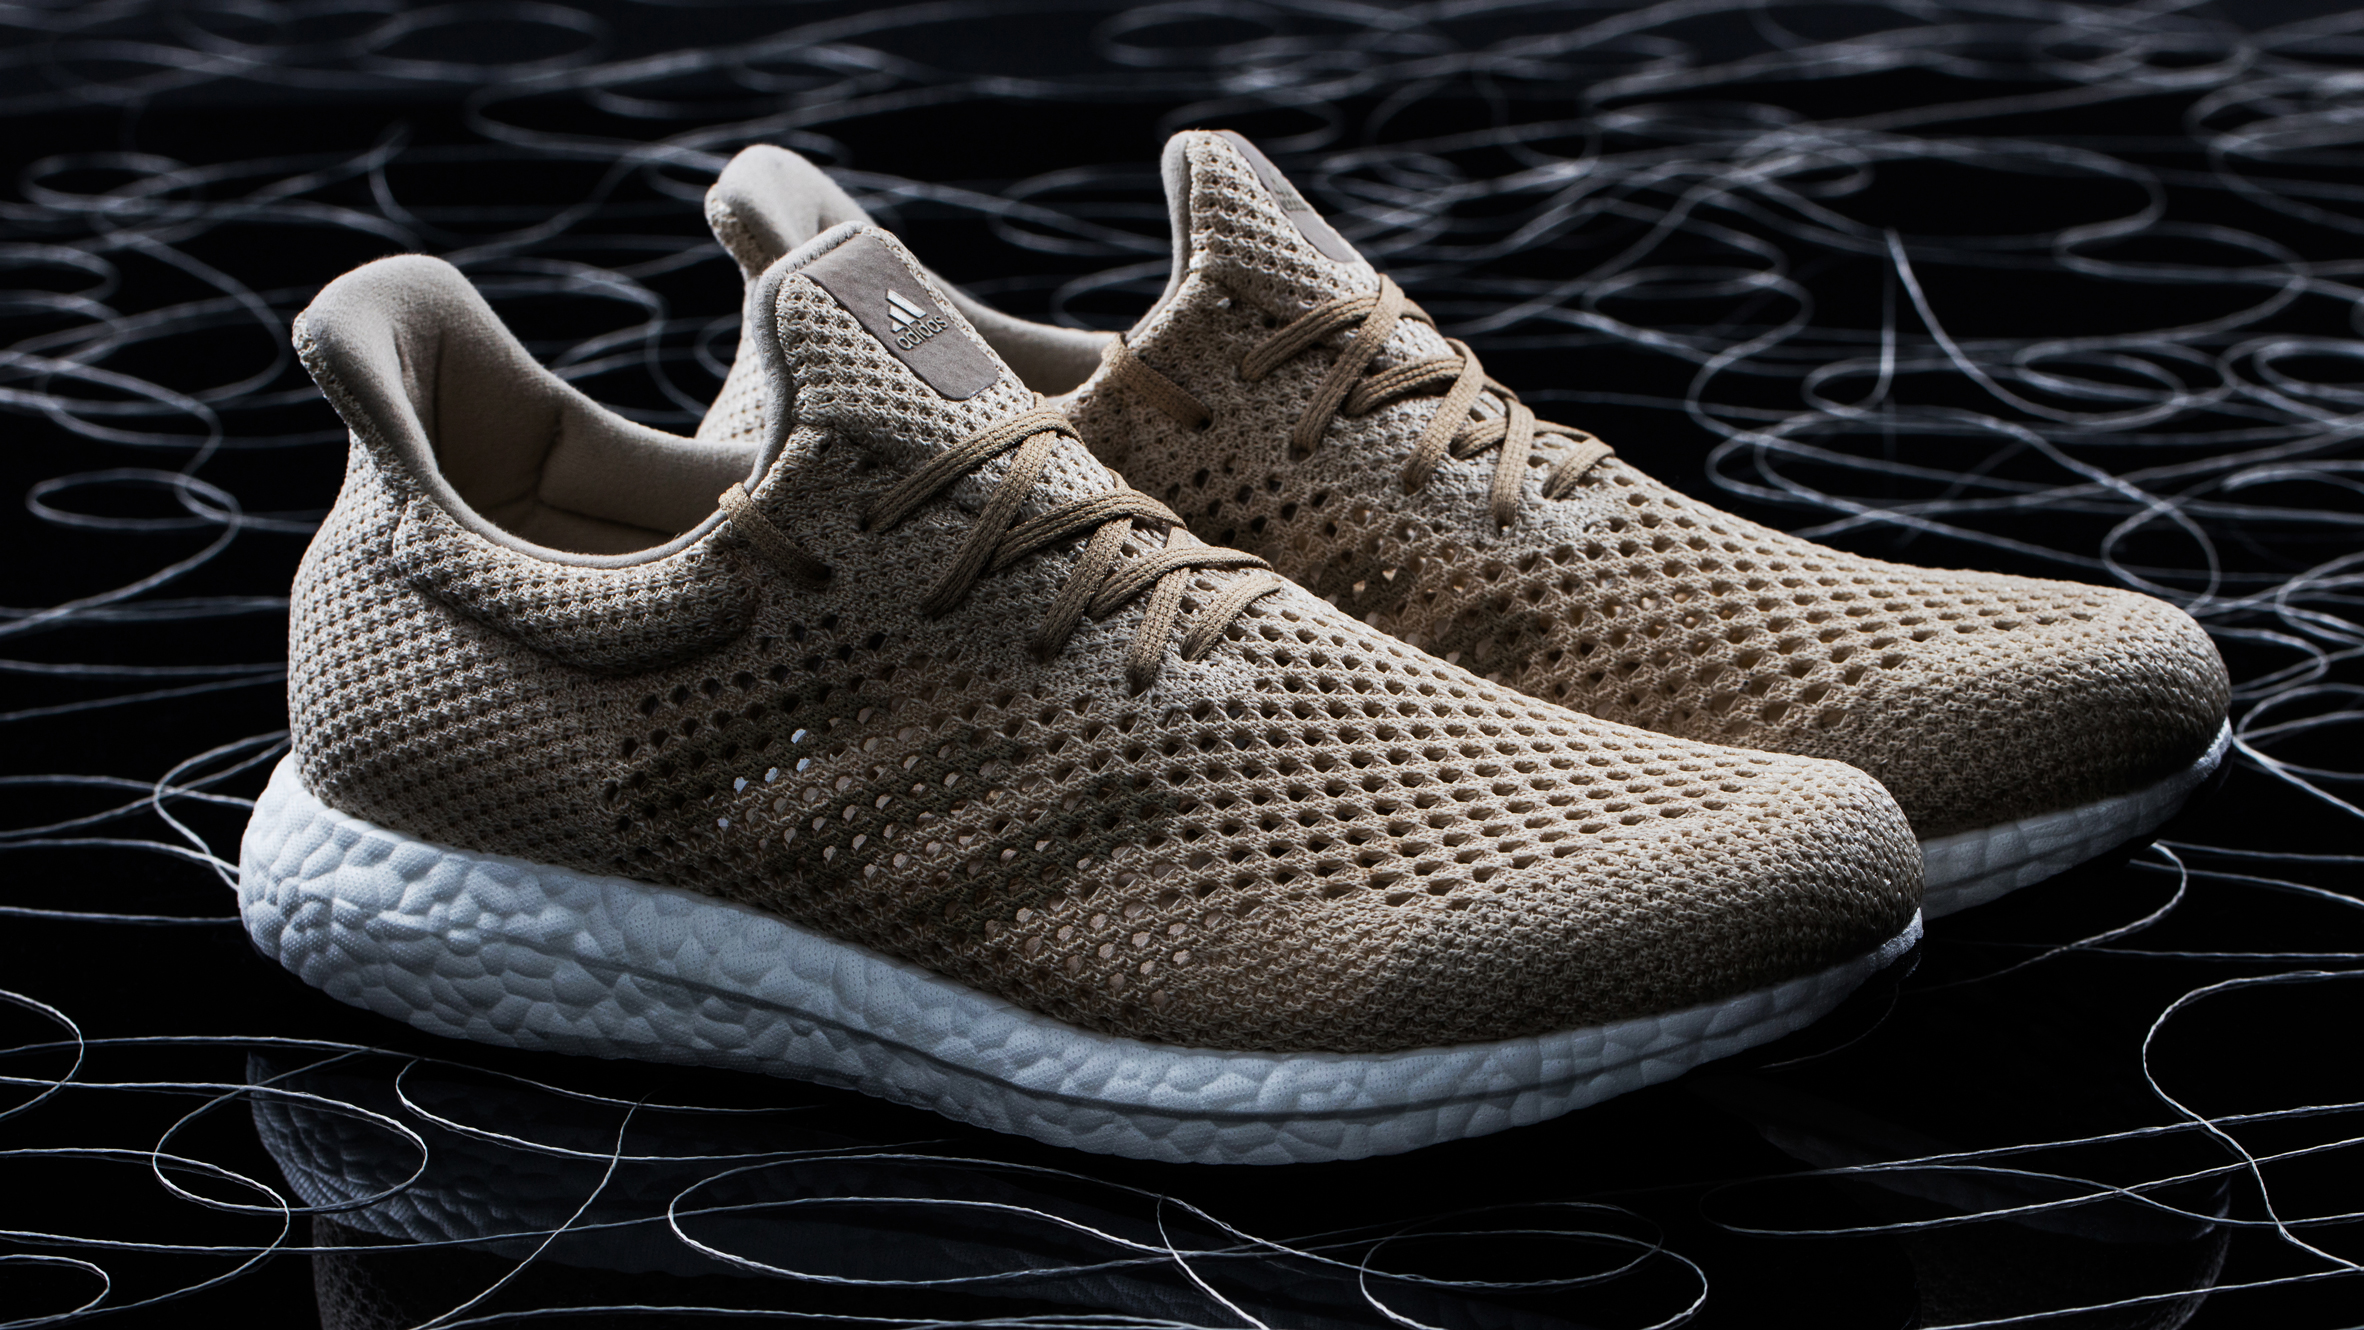 Adidas Futurecraft Biofabric shoes